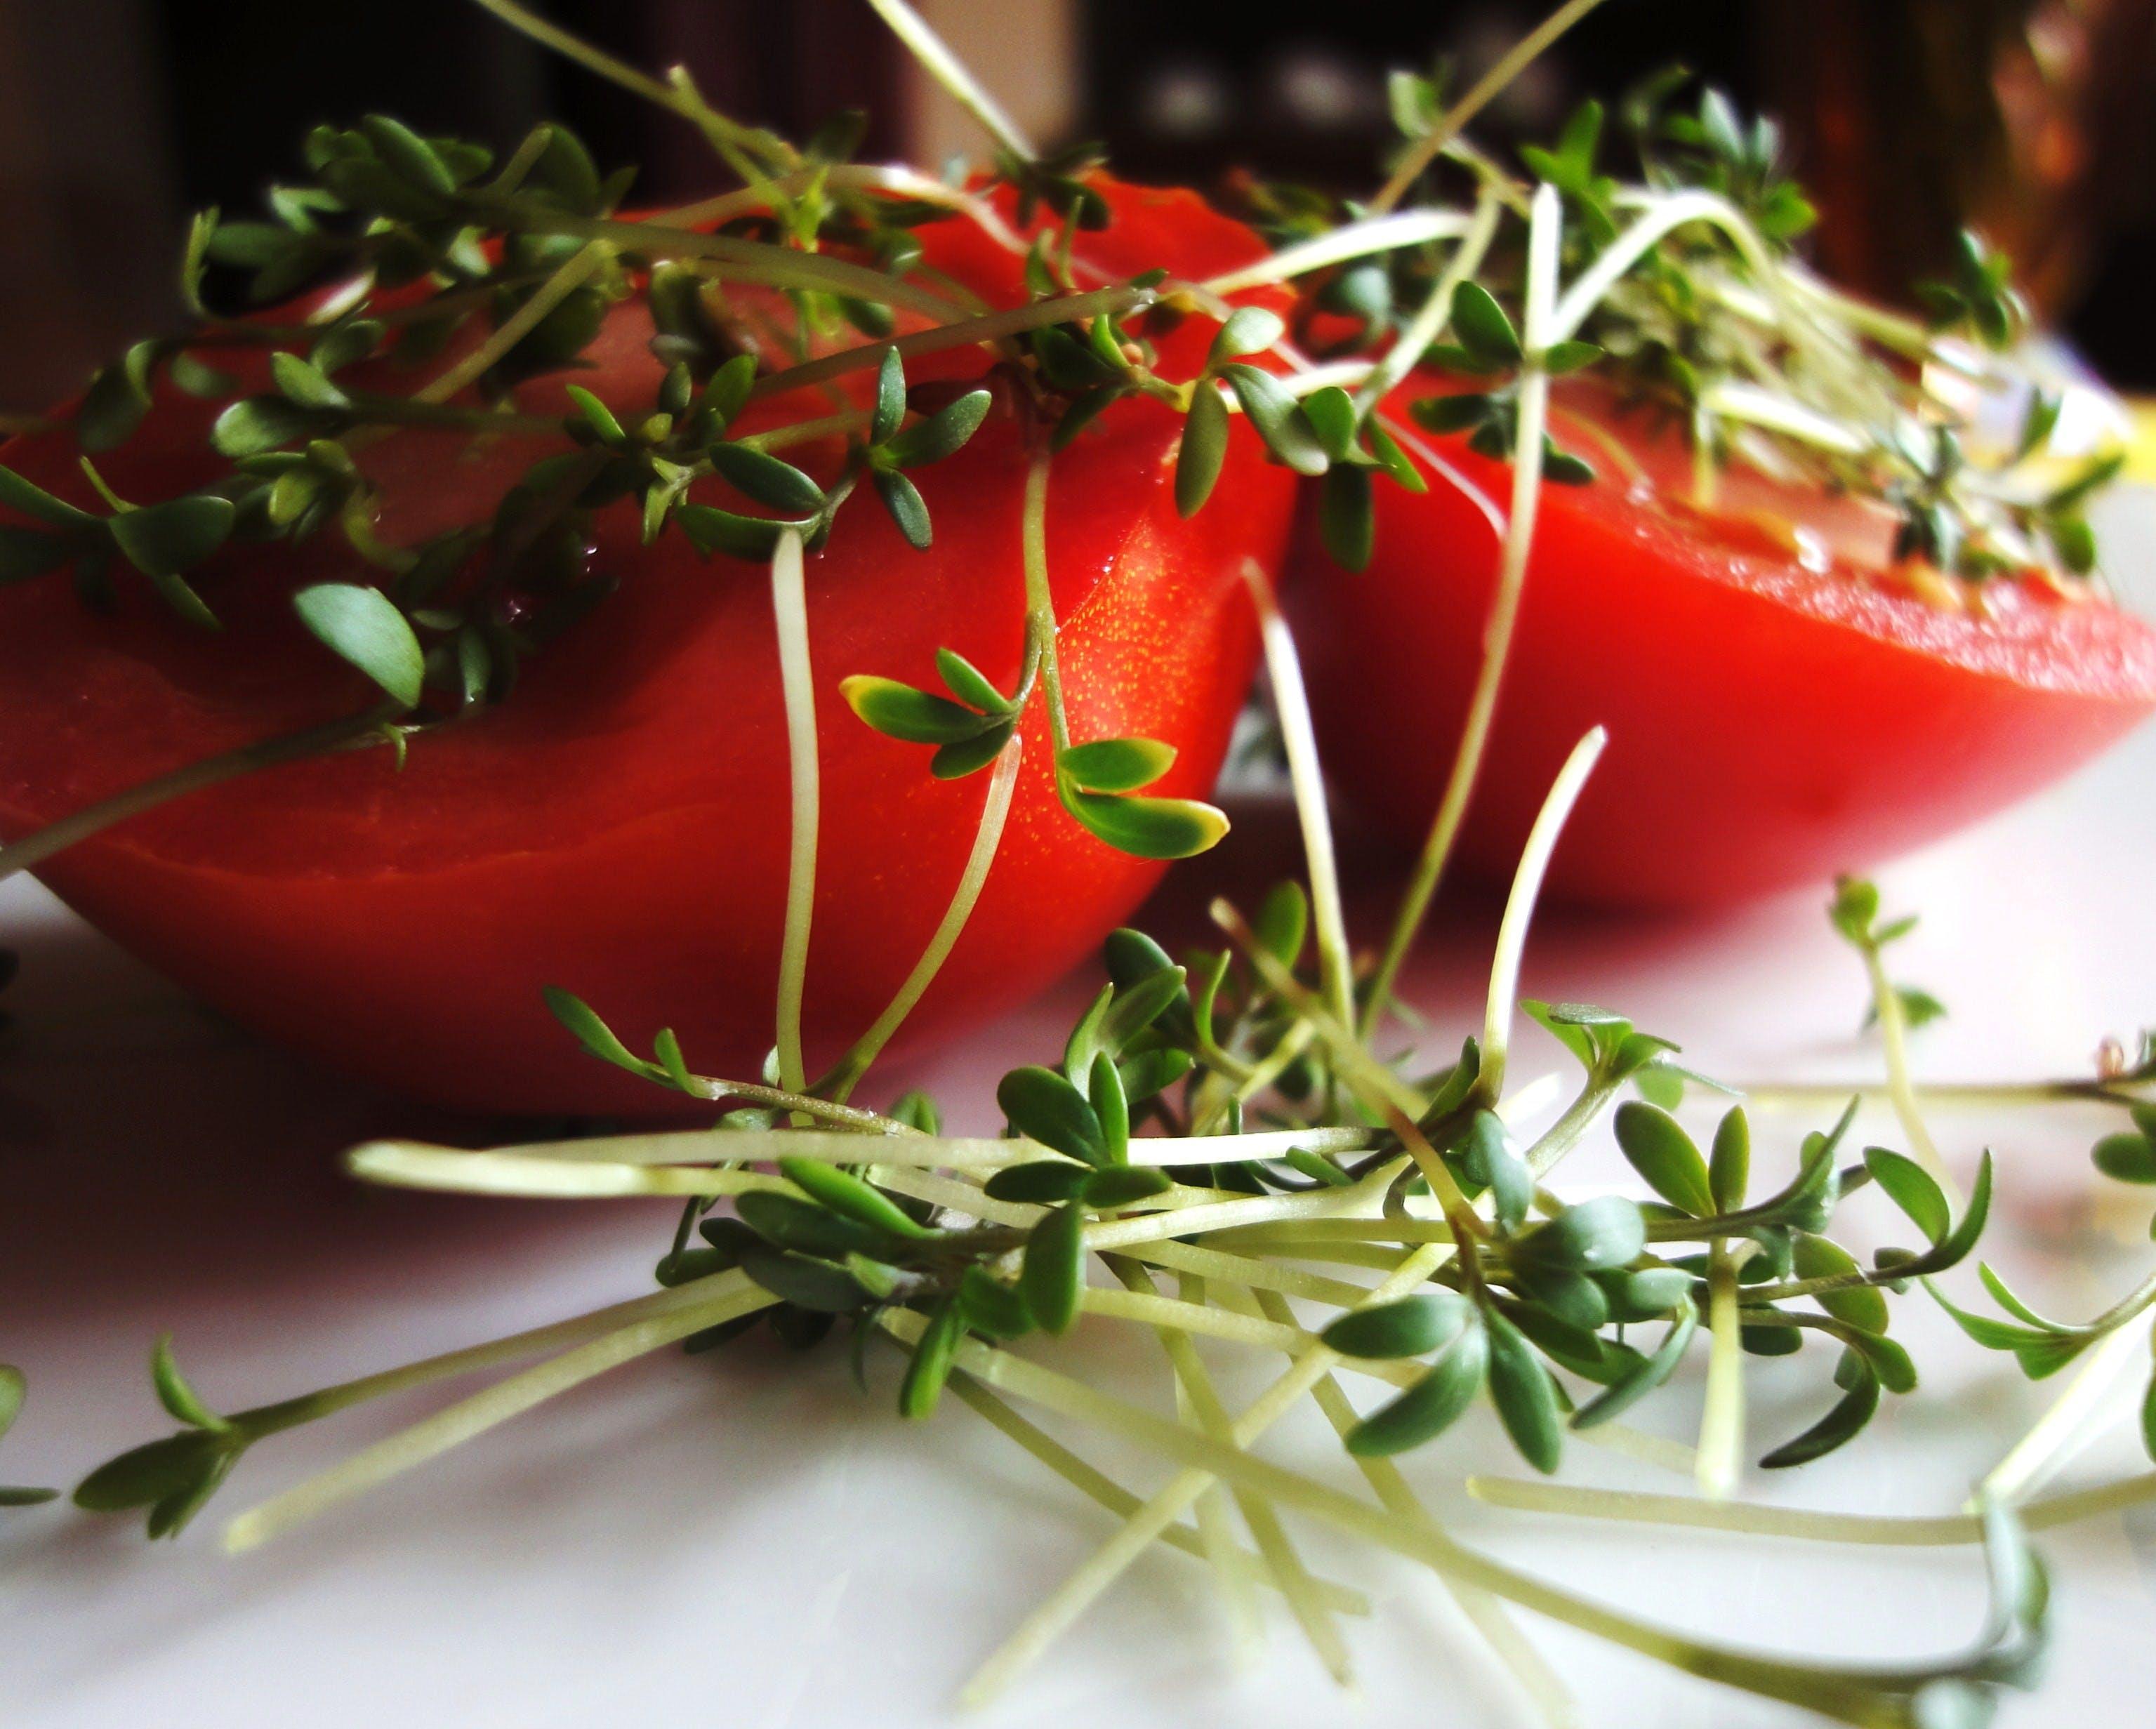 Red Food and Leaf Vegetable